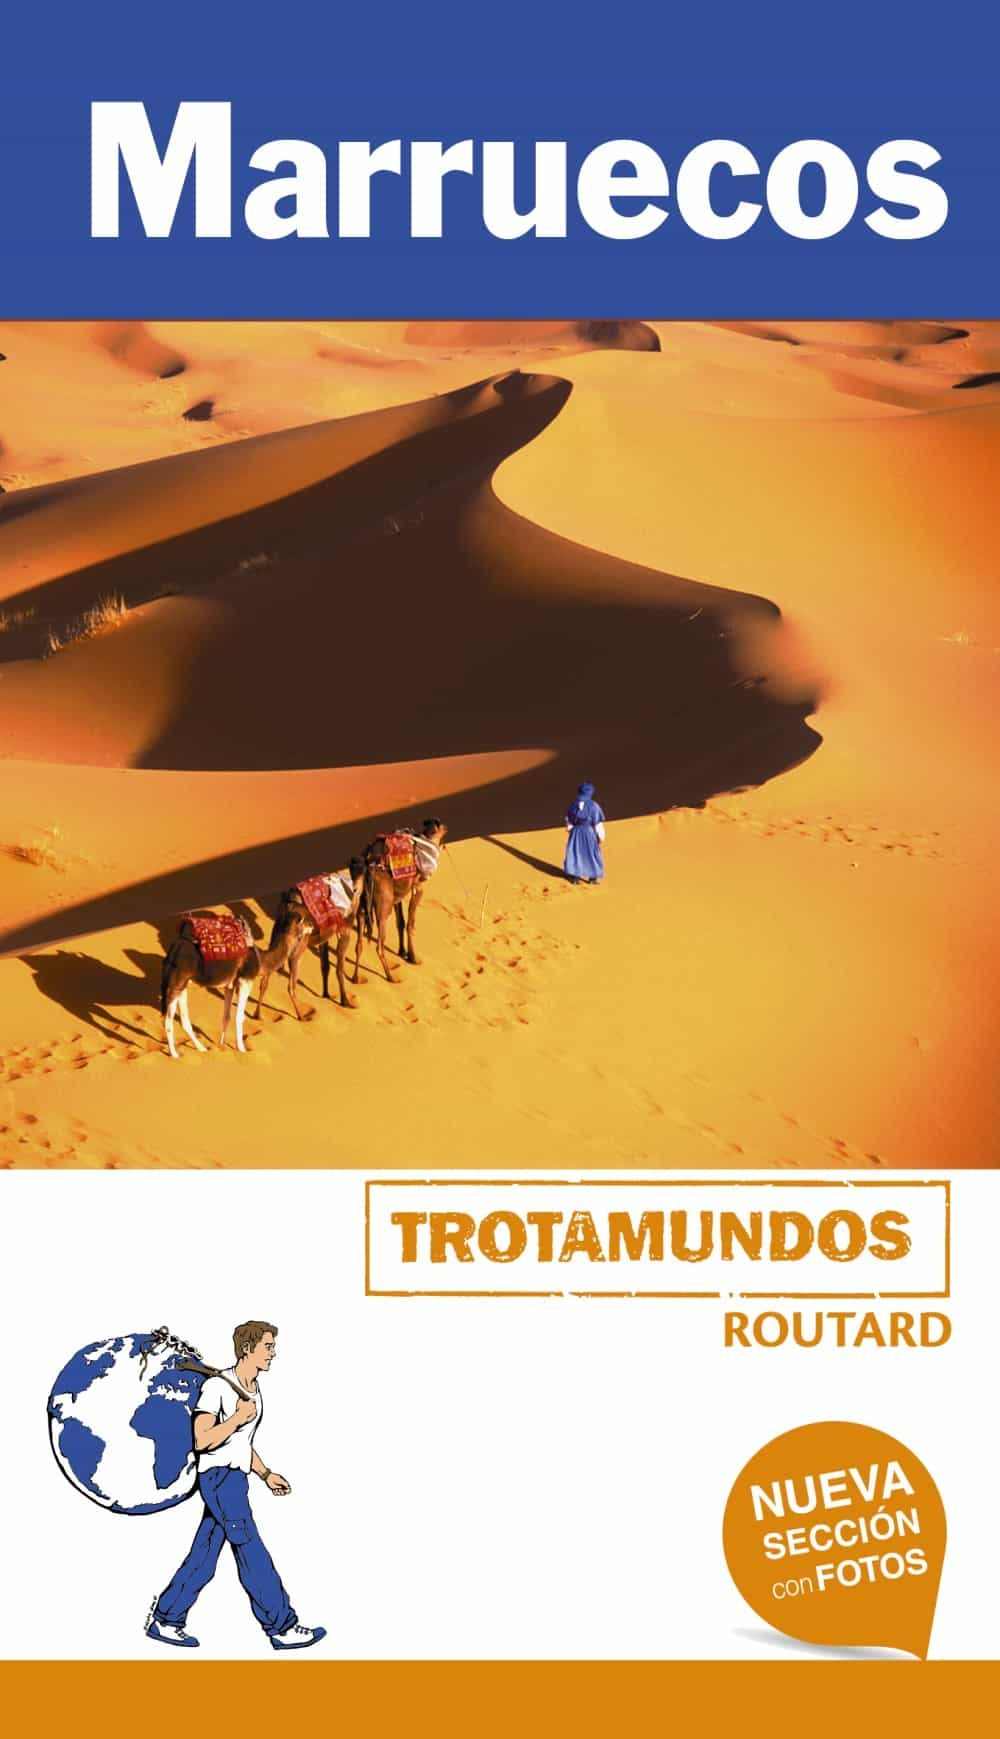 Marruecos 2018 (trotamundos) 2ª Ed. por Philippe Gloaguen